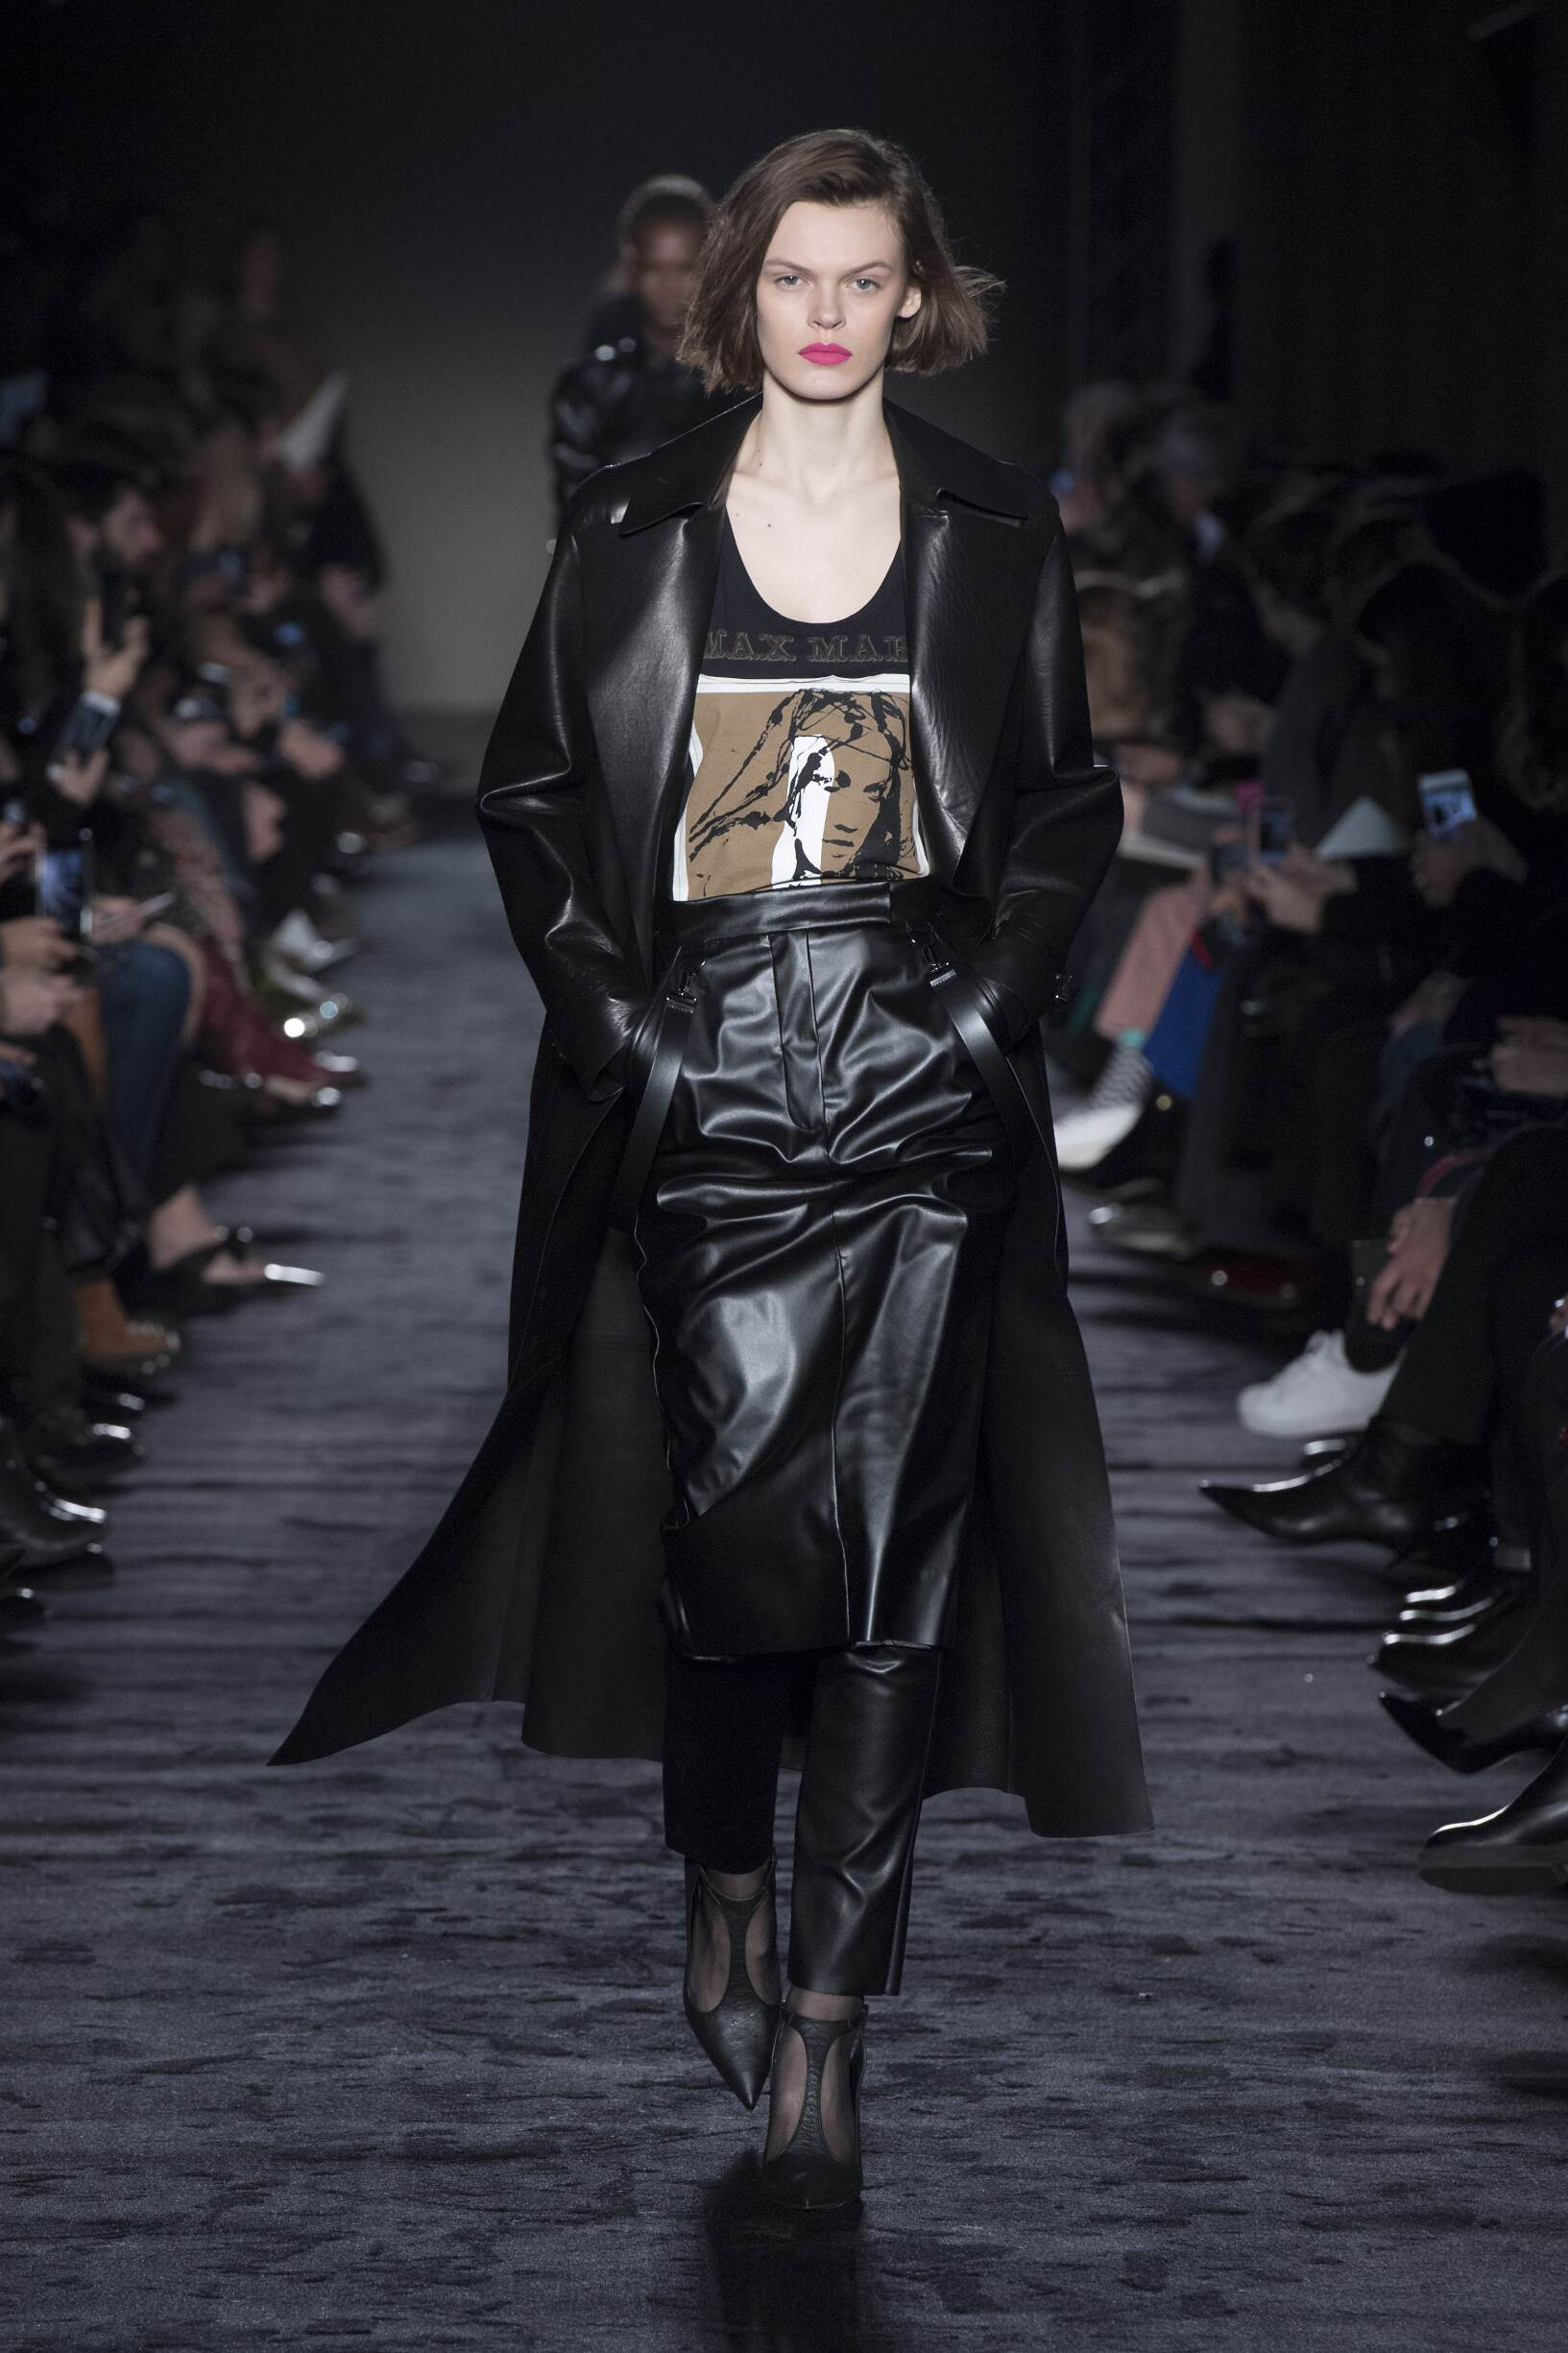 Woman FW 2018-19 Fashion Show Max Mara